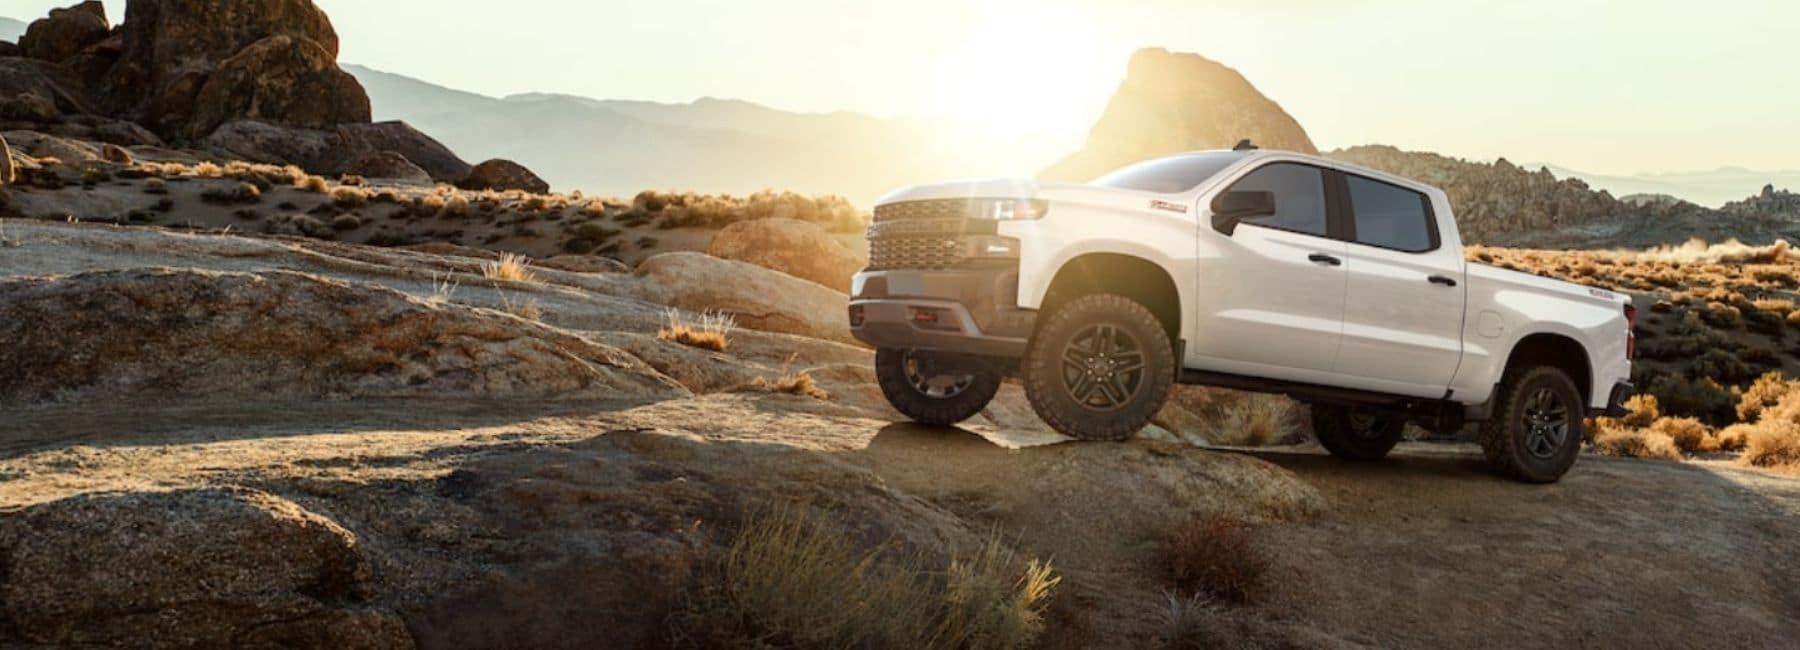 White 2021 Chevrolet Silverado Climbing Rocks In Desert With Sun In Background   Chevrolet Dealer Near Hobbs, NM